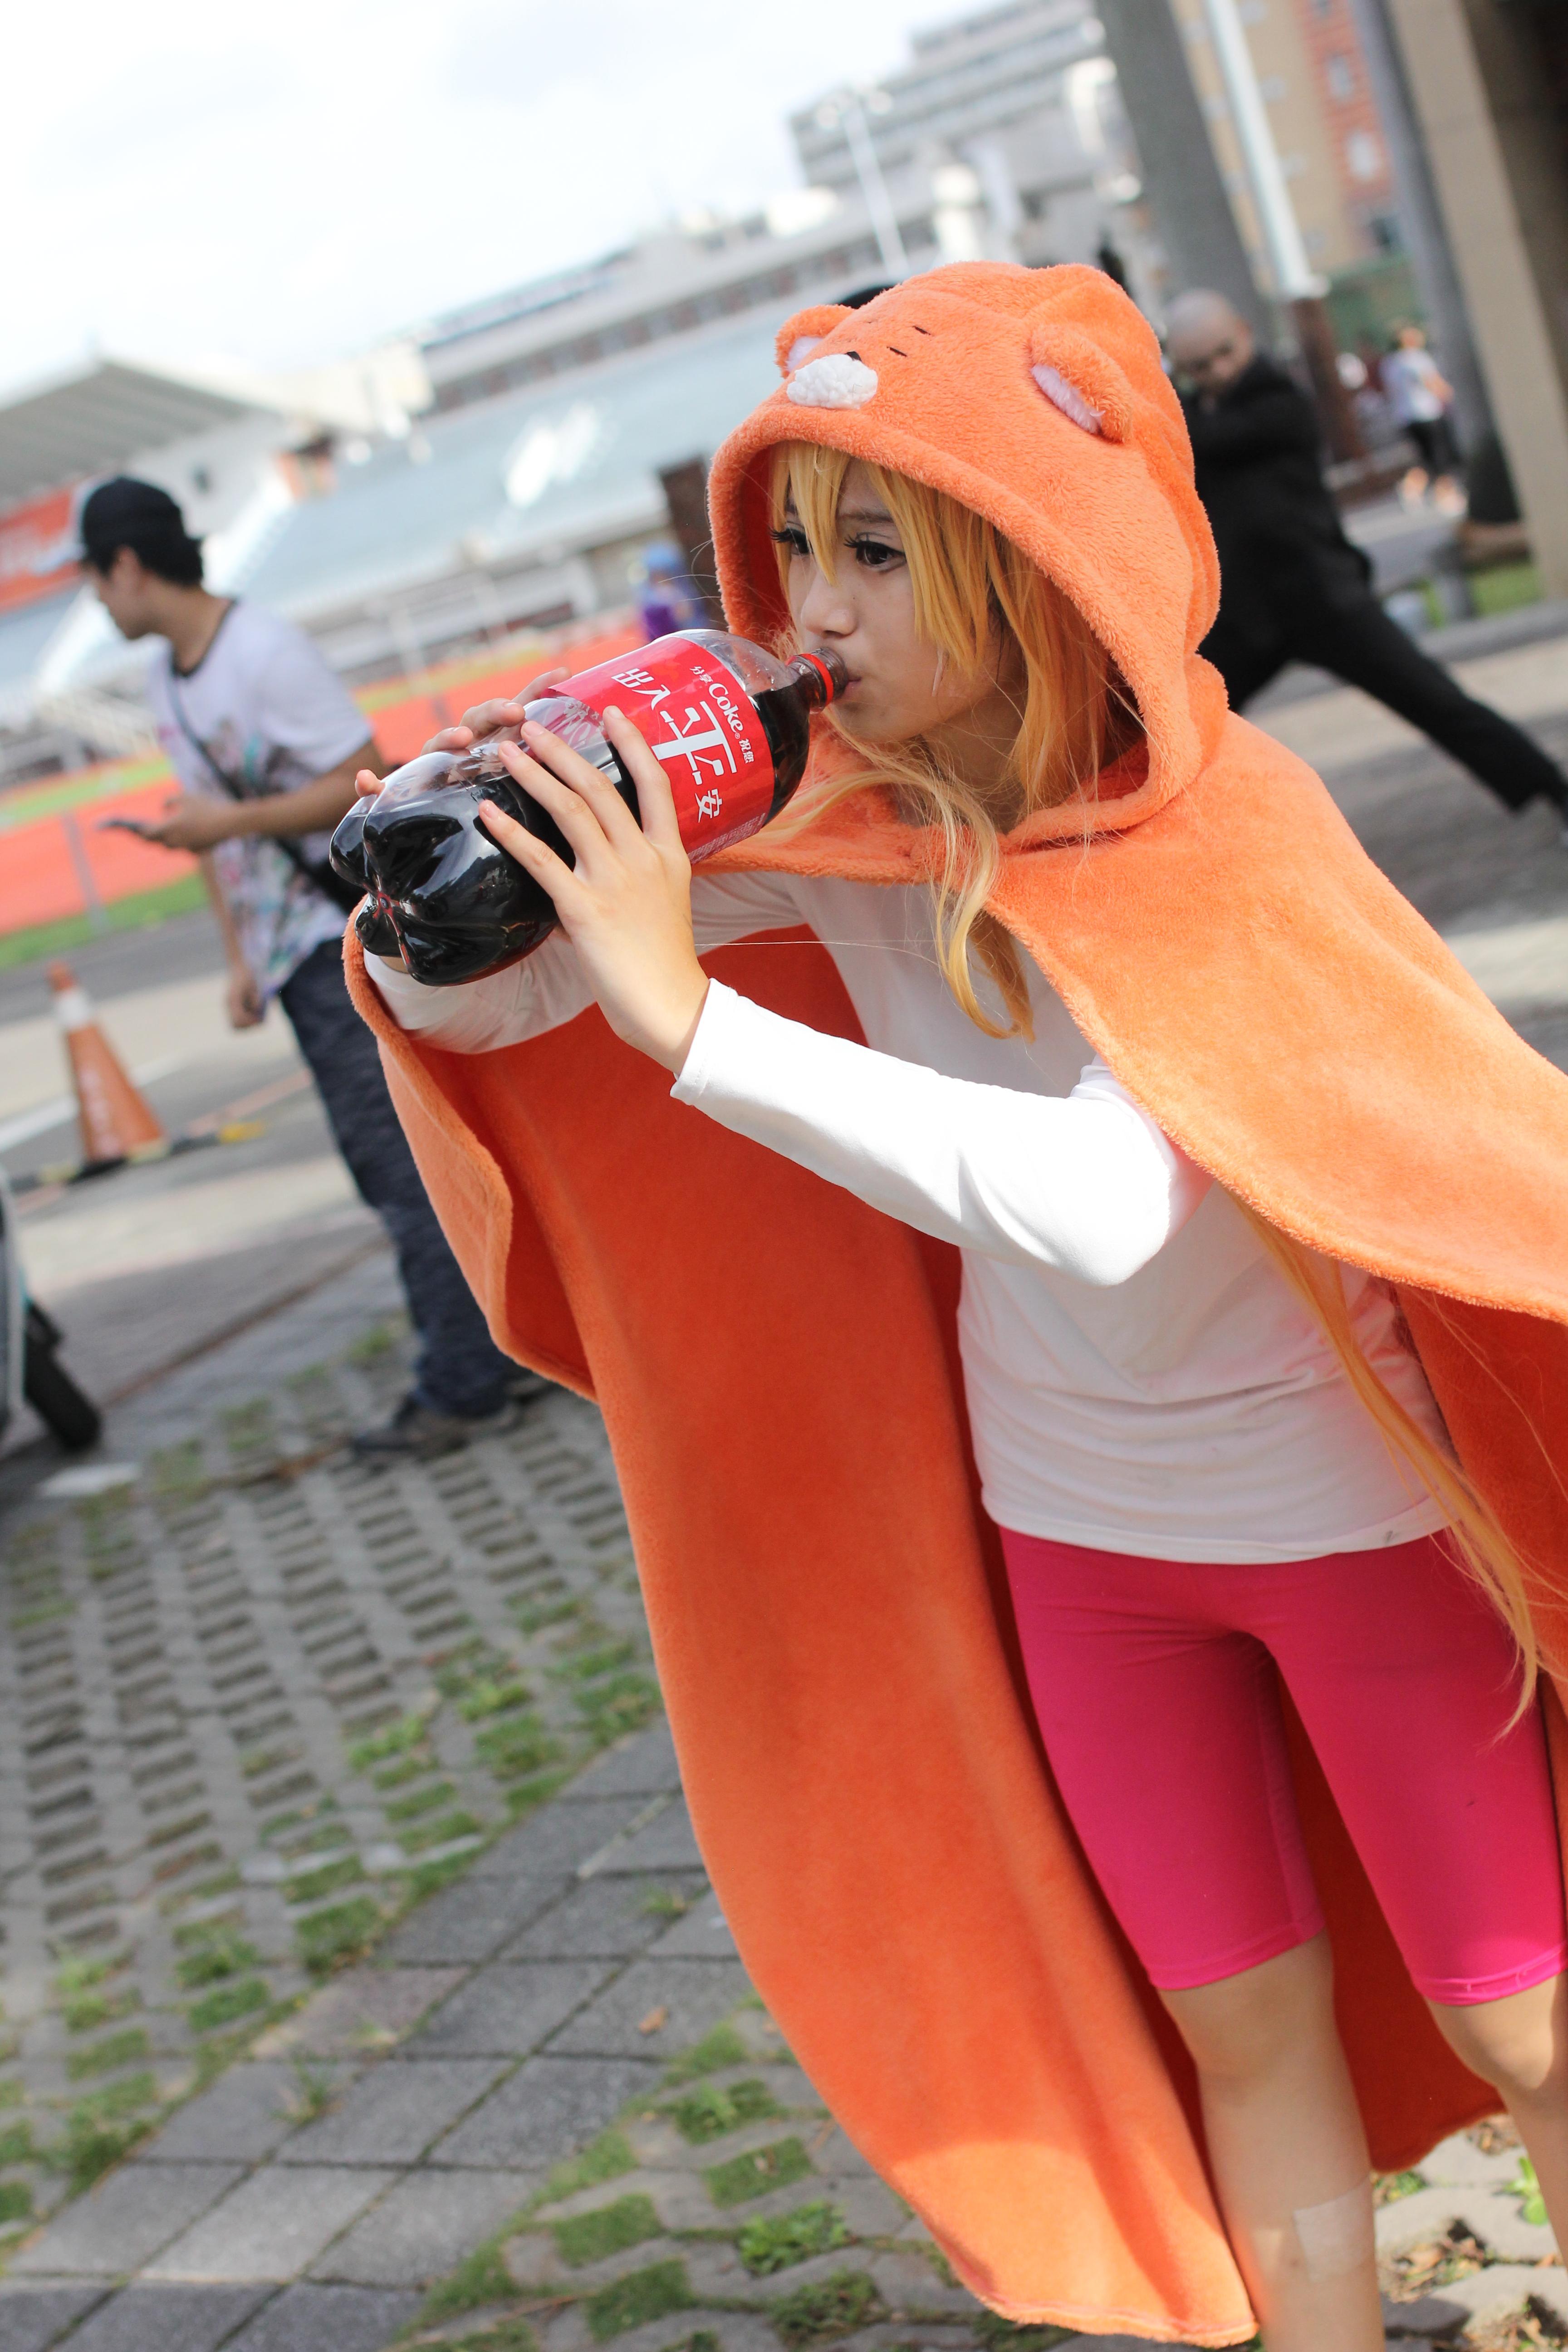 File:Cosplayer of Umaru Doma, Himouto! Umaru-chan at CWT T14